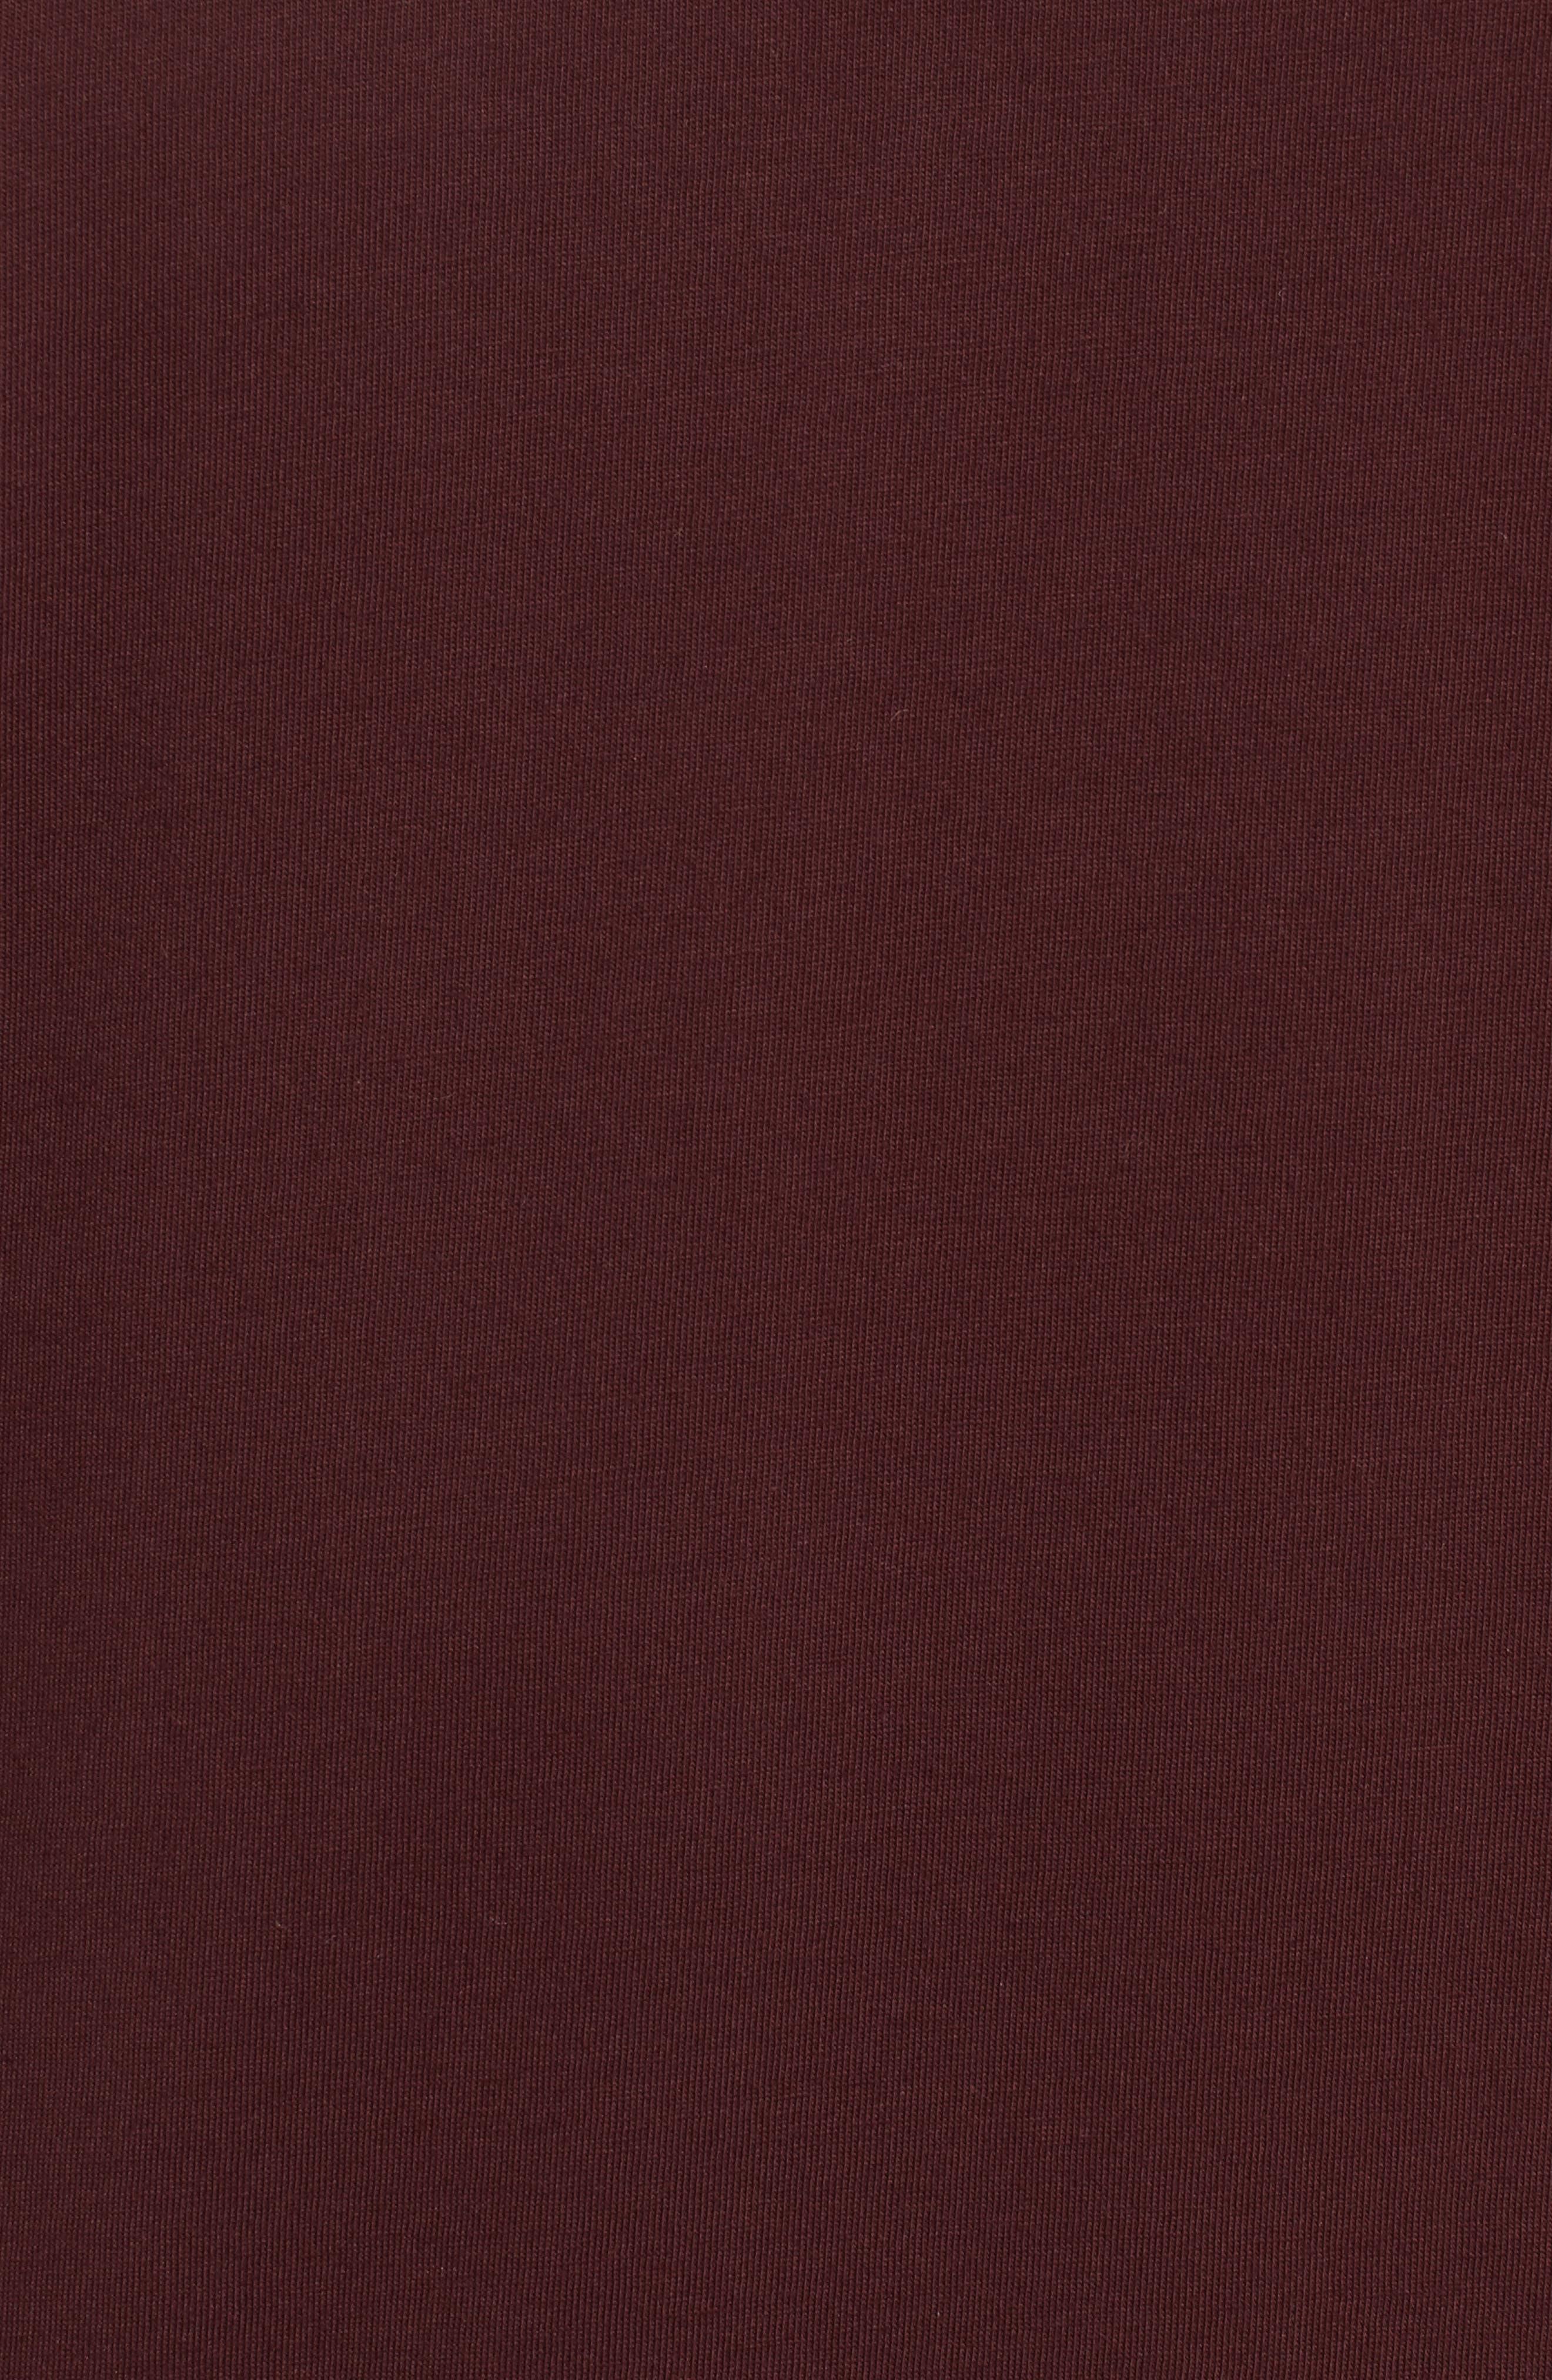 Tessler Crewneck T-Shirt,                             Alternate thumbnail 11, color,                             Black